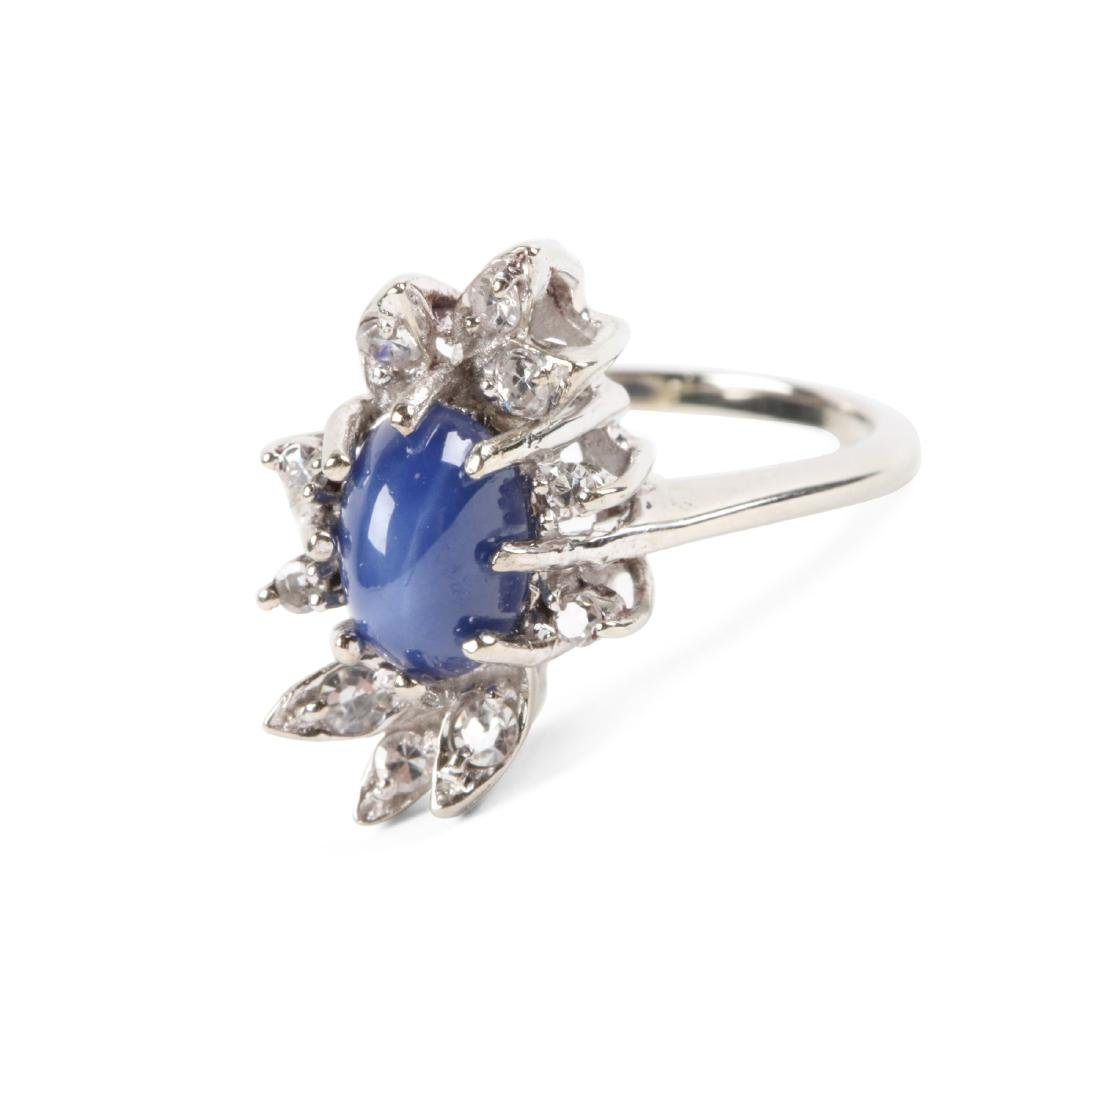 A 14K Gold, Diamond Ring